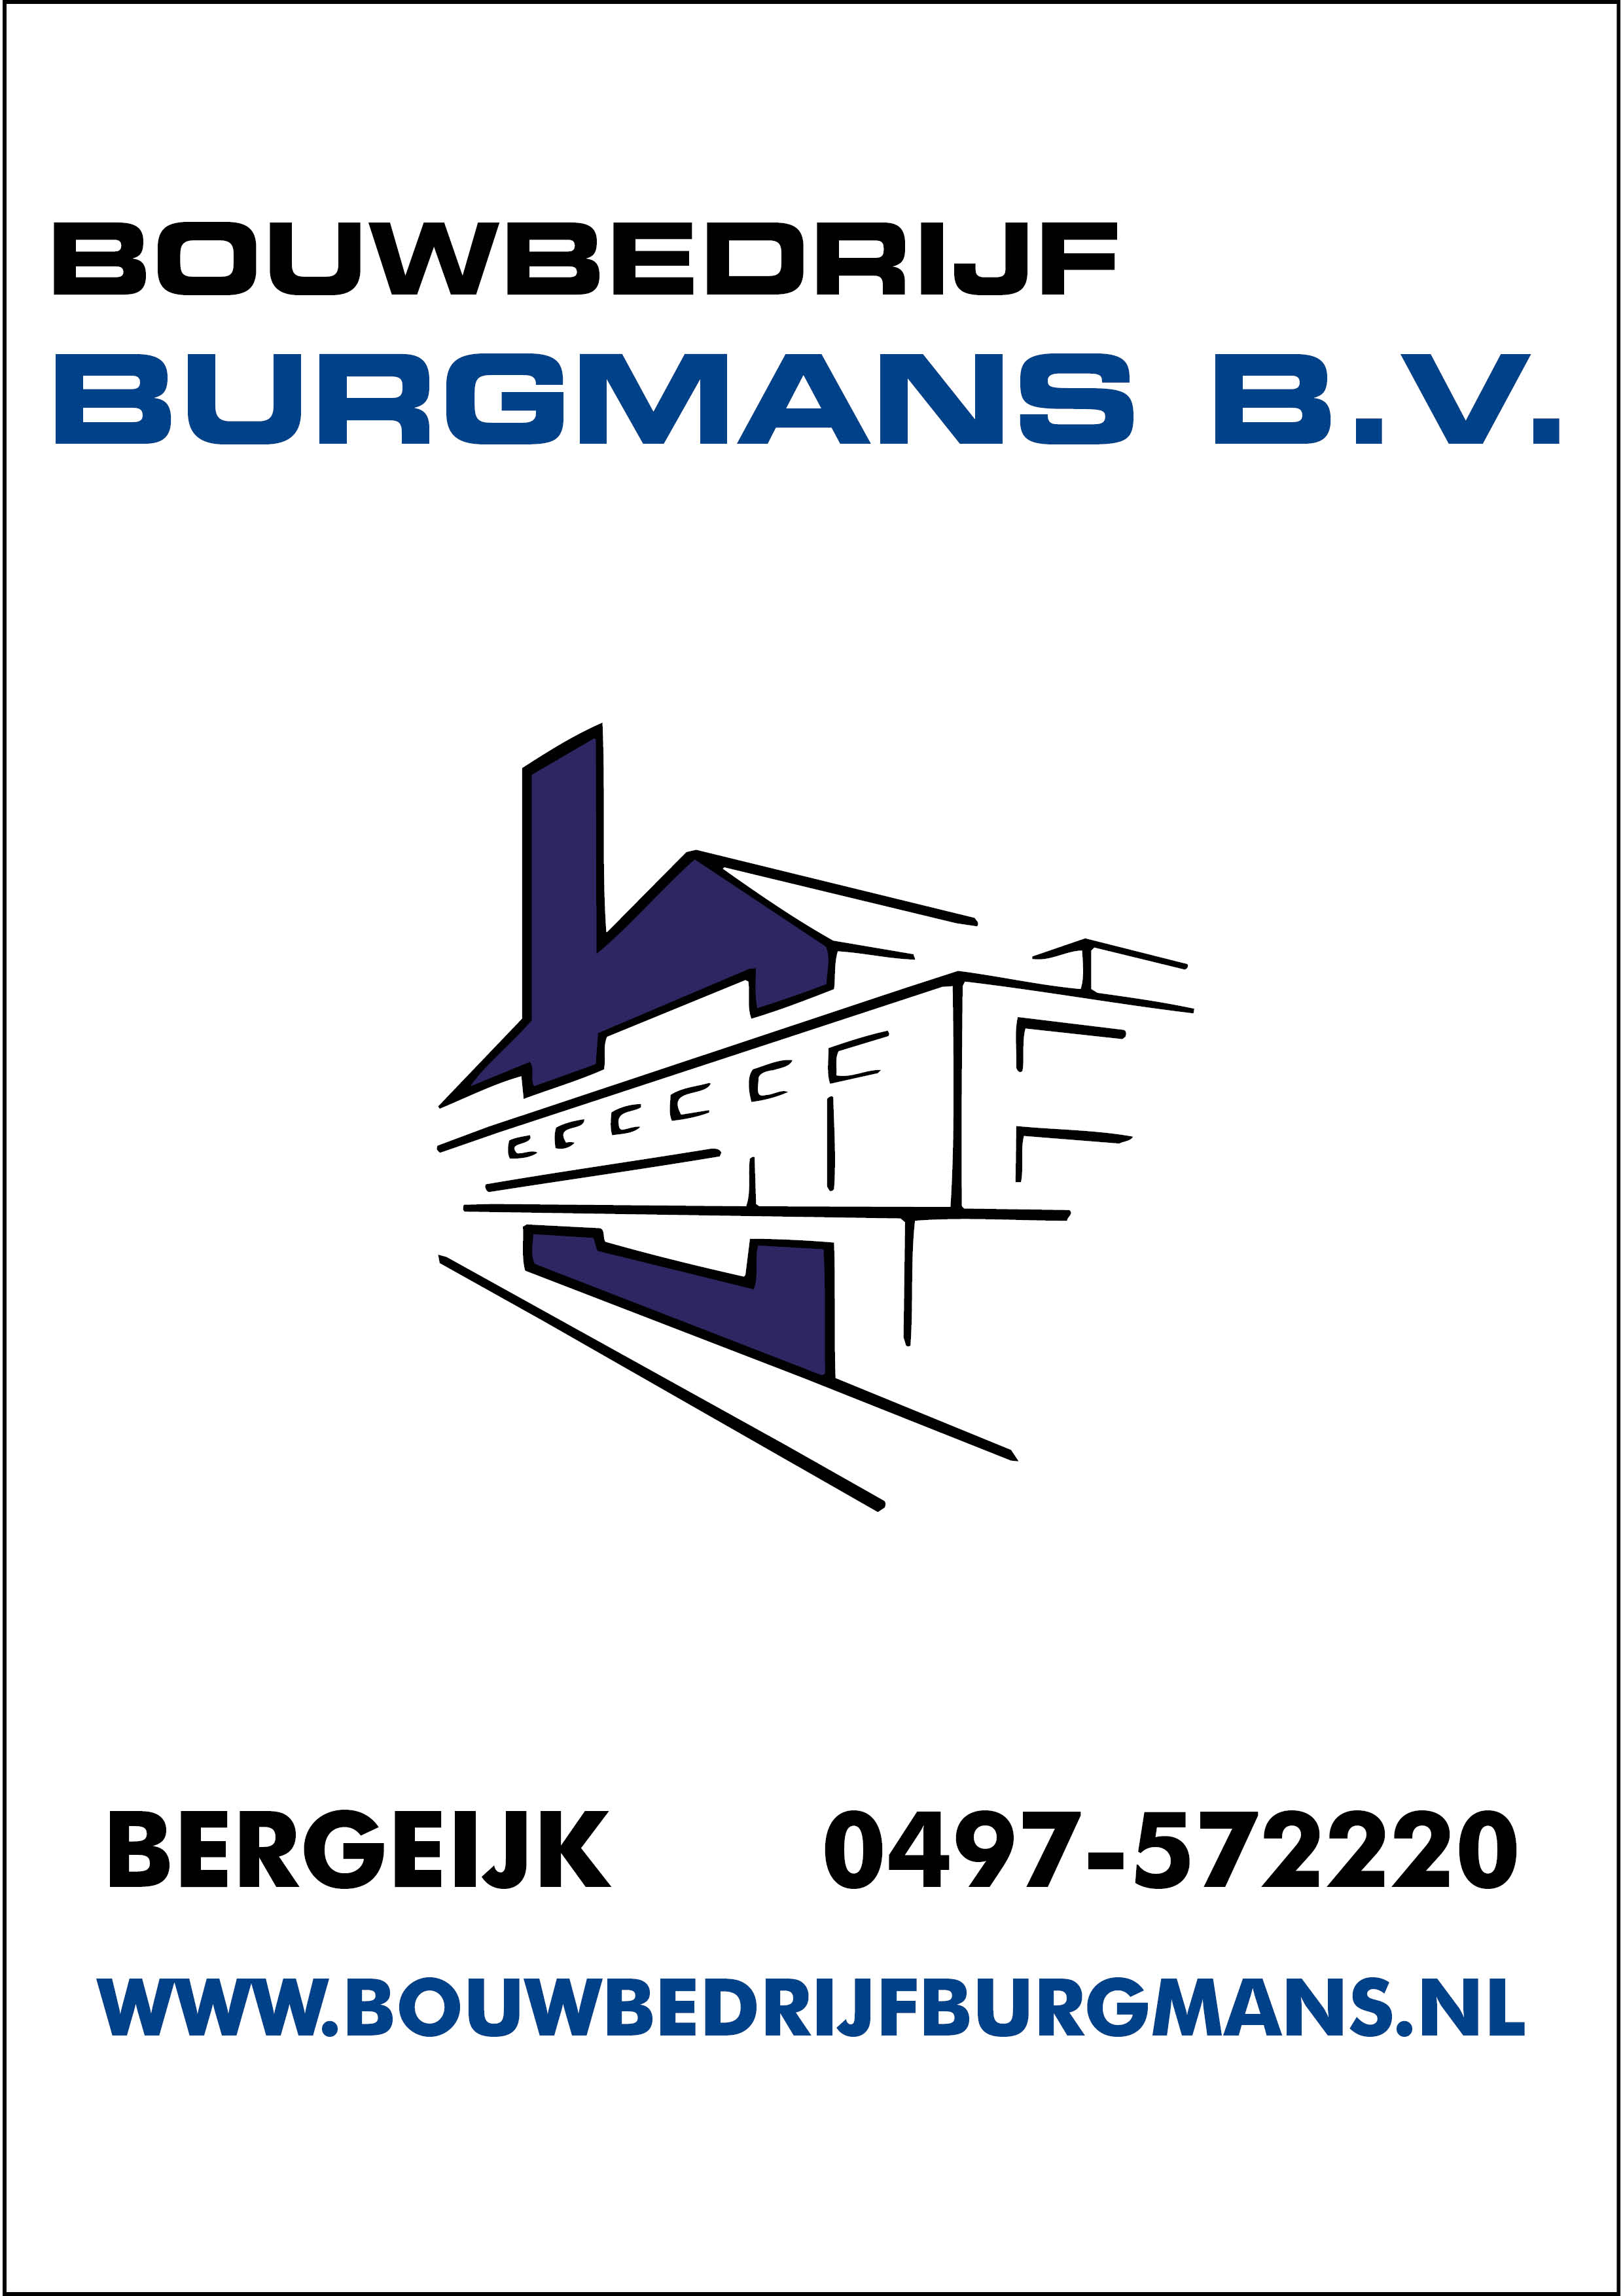 Bouwbedrijf Burgmans B.V.